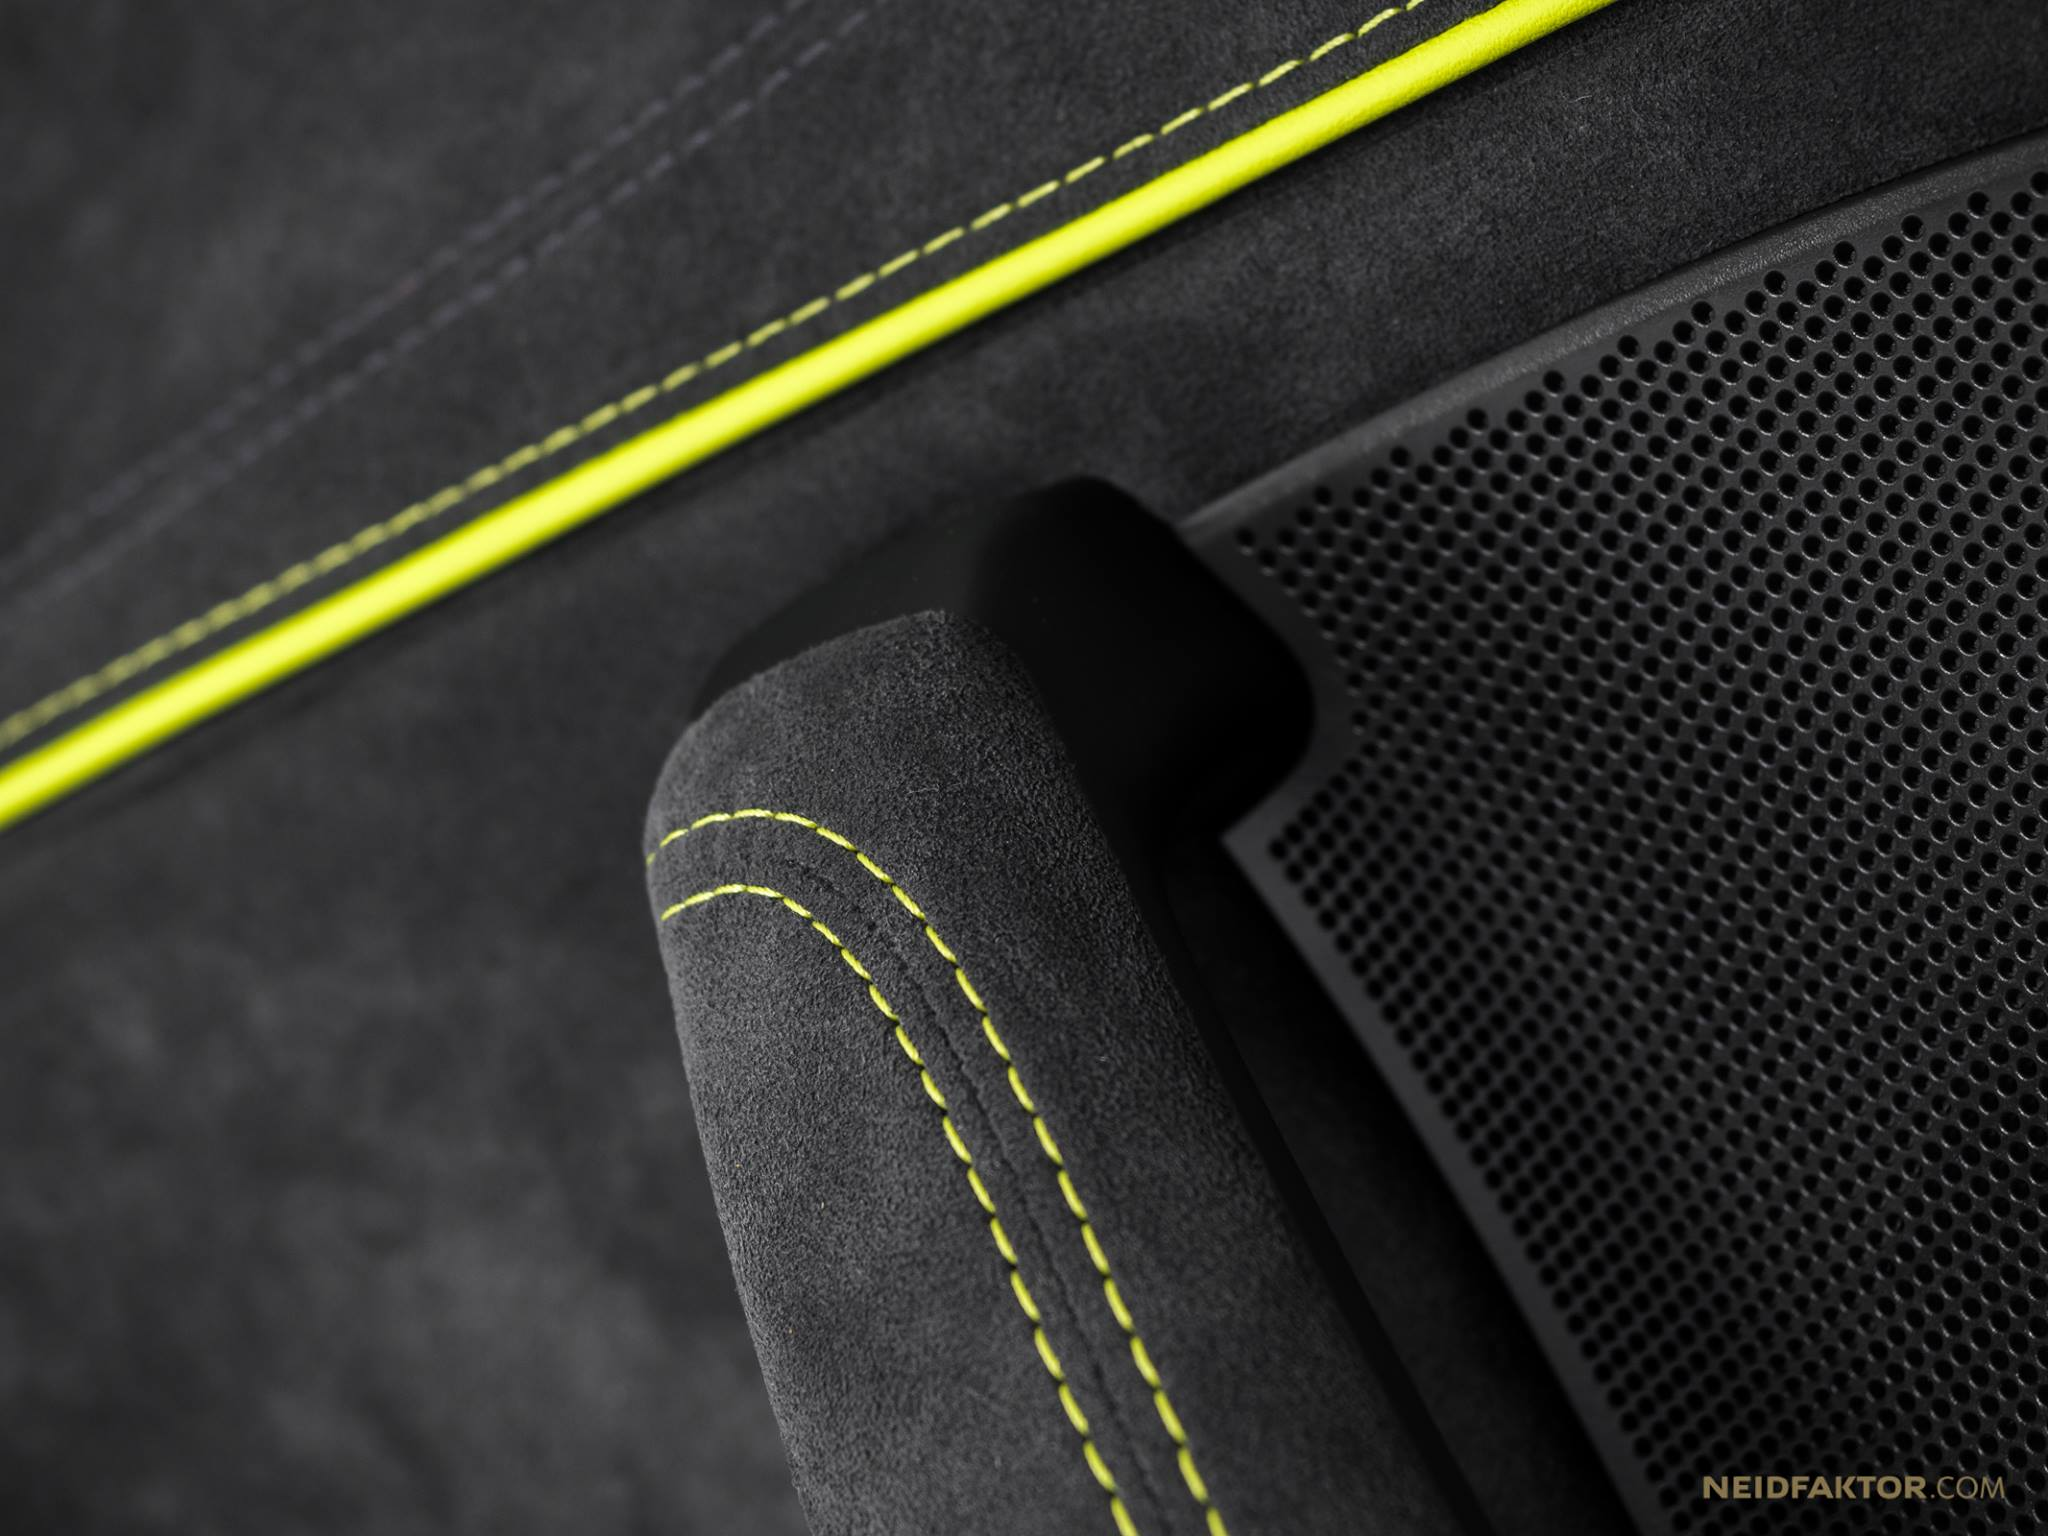 Neon Car Theme Wallpaper Audi Rs3 Interior By Neidfaktor Neon Yellow Alcantara